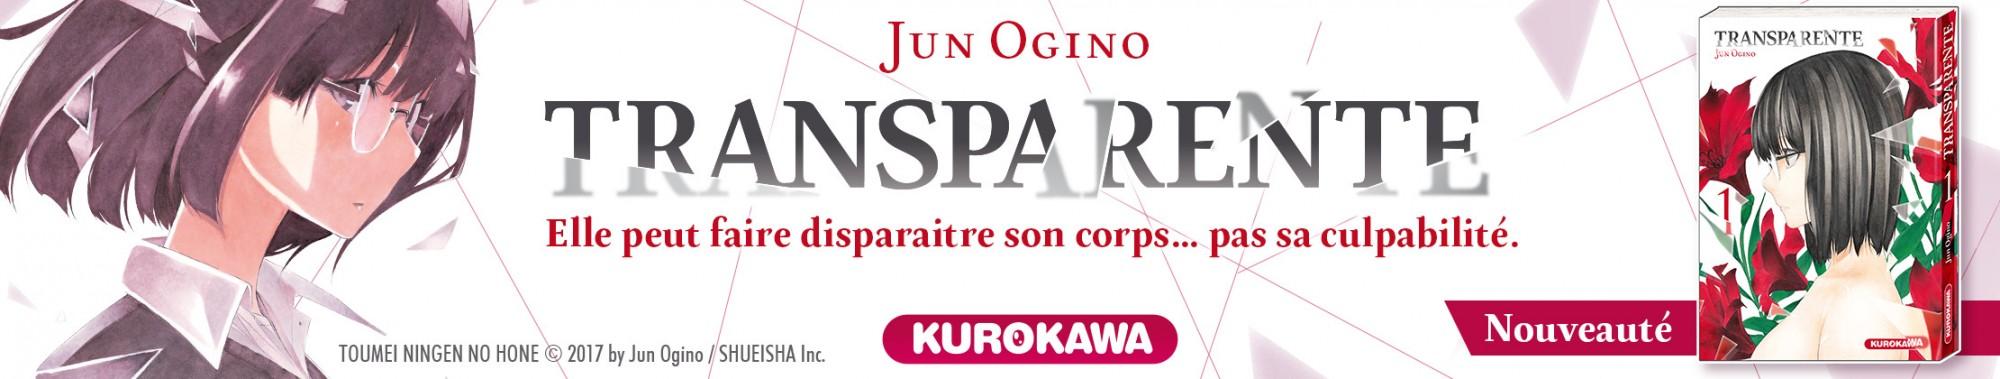 Bannière - Kurokawa - Transparente T1